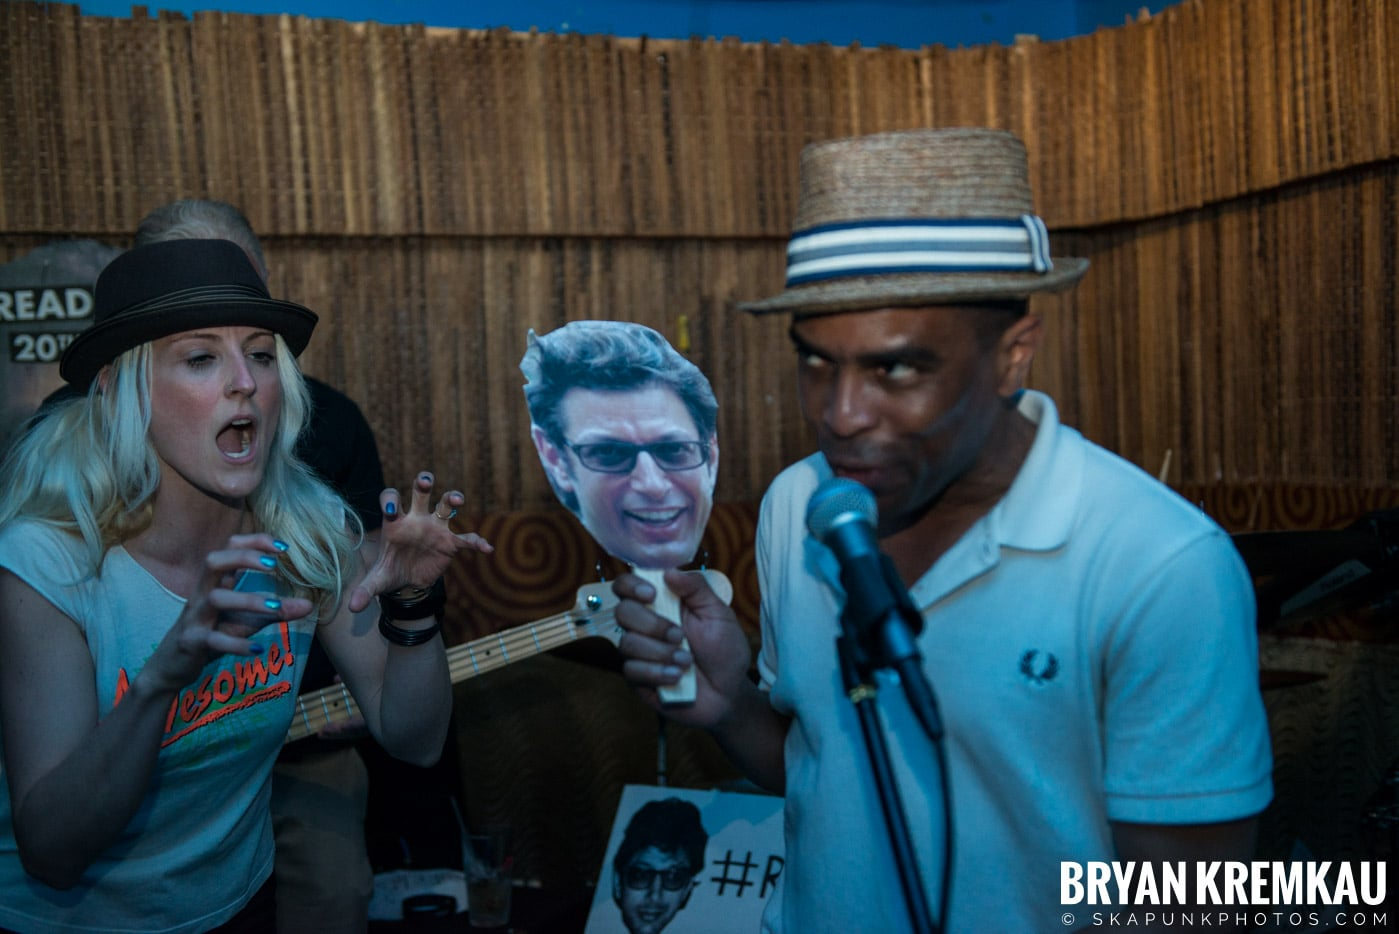 ReadJunk.com 20th Anniversary Party @ Otto's Shrunken Head, NYC - 4.29.17 (43)